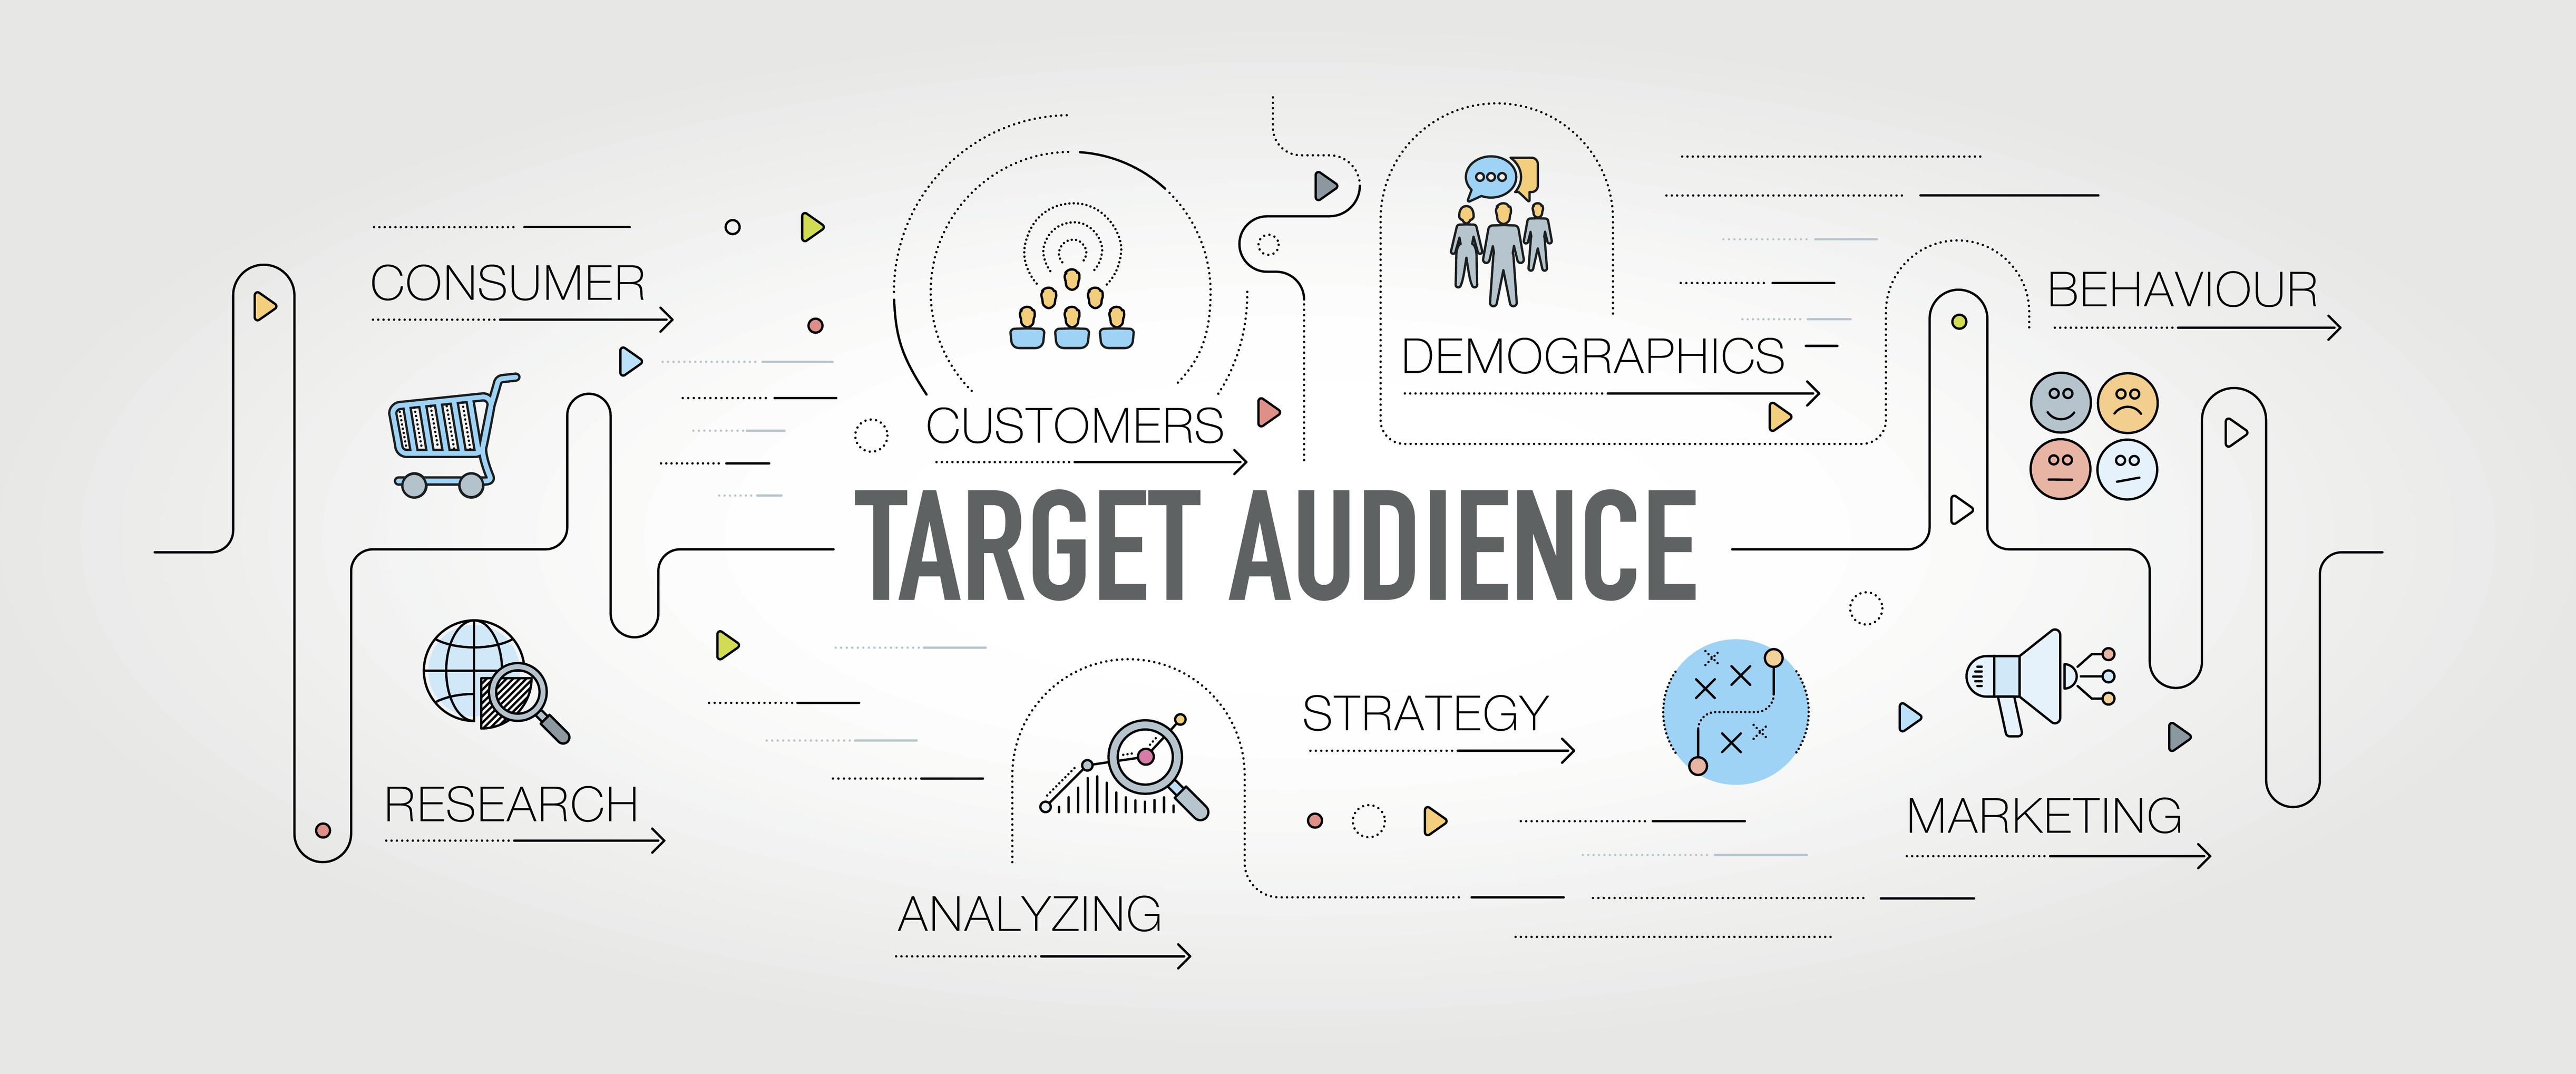 The Psychology Behind Digital Customer Segmentation